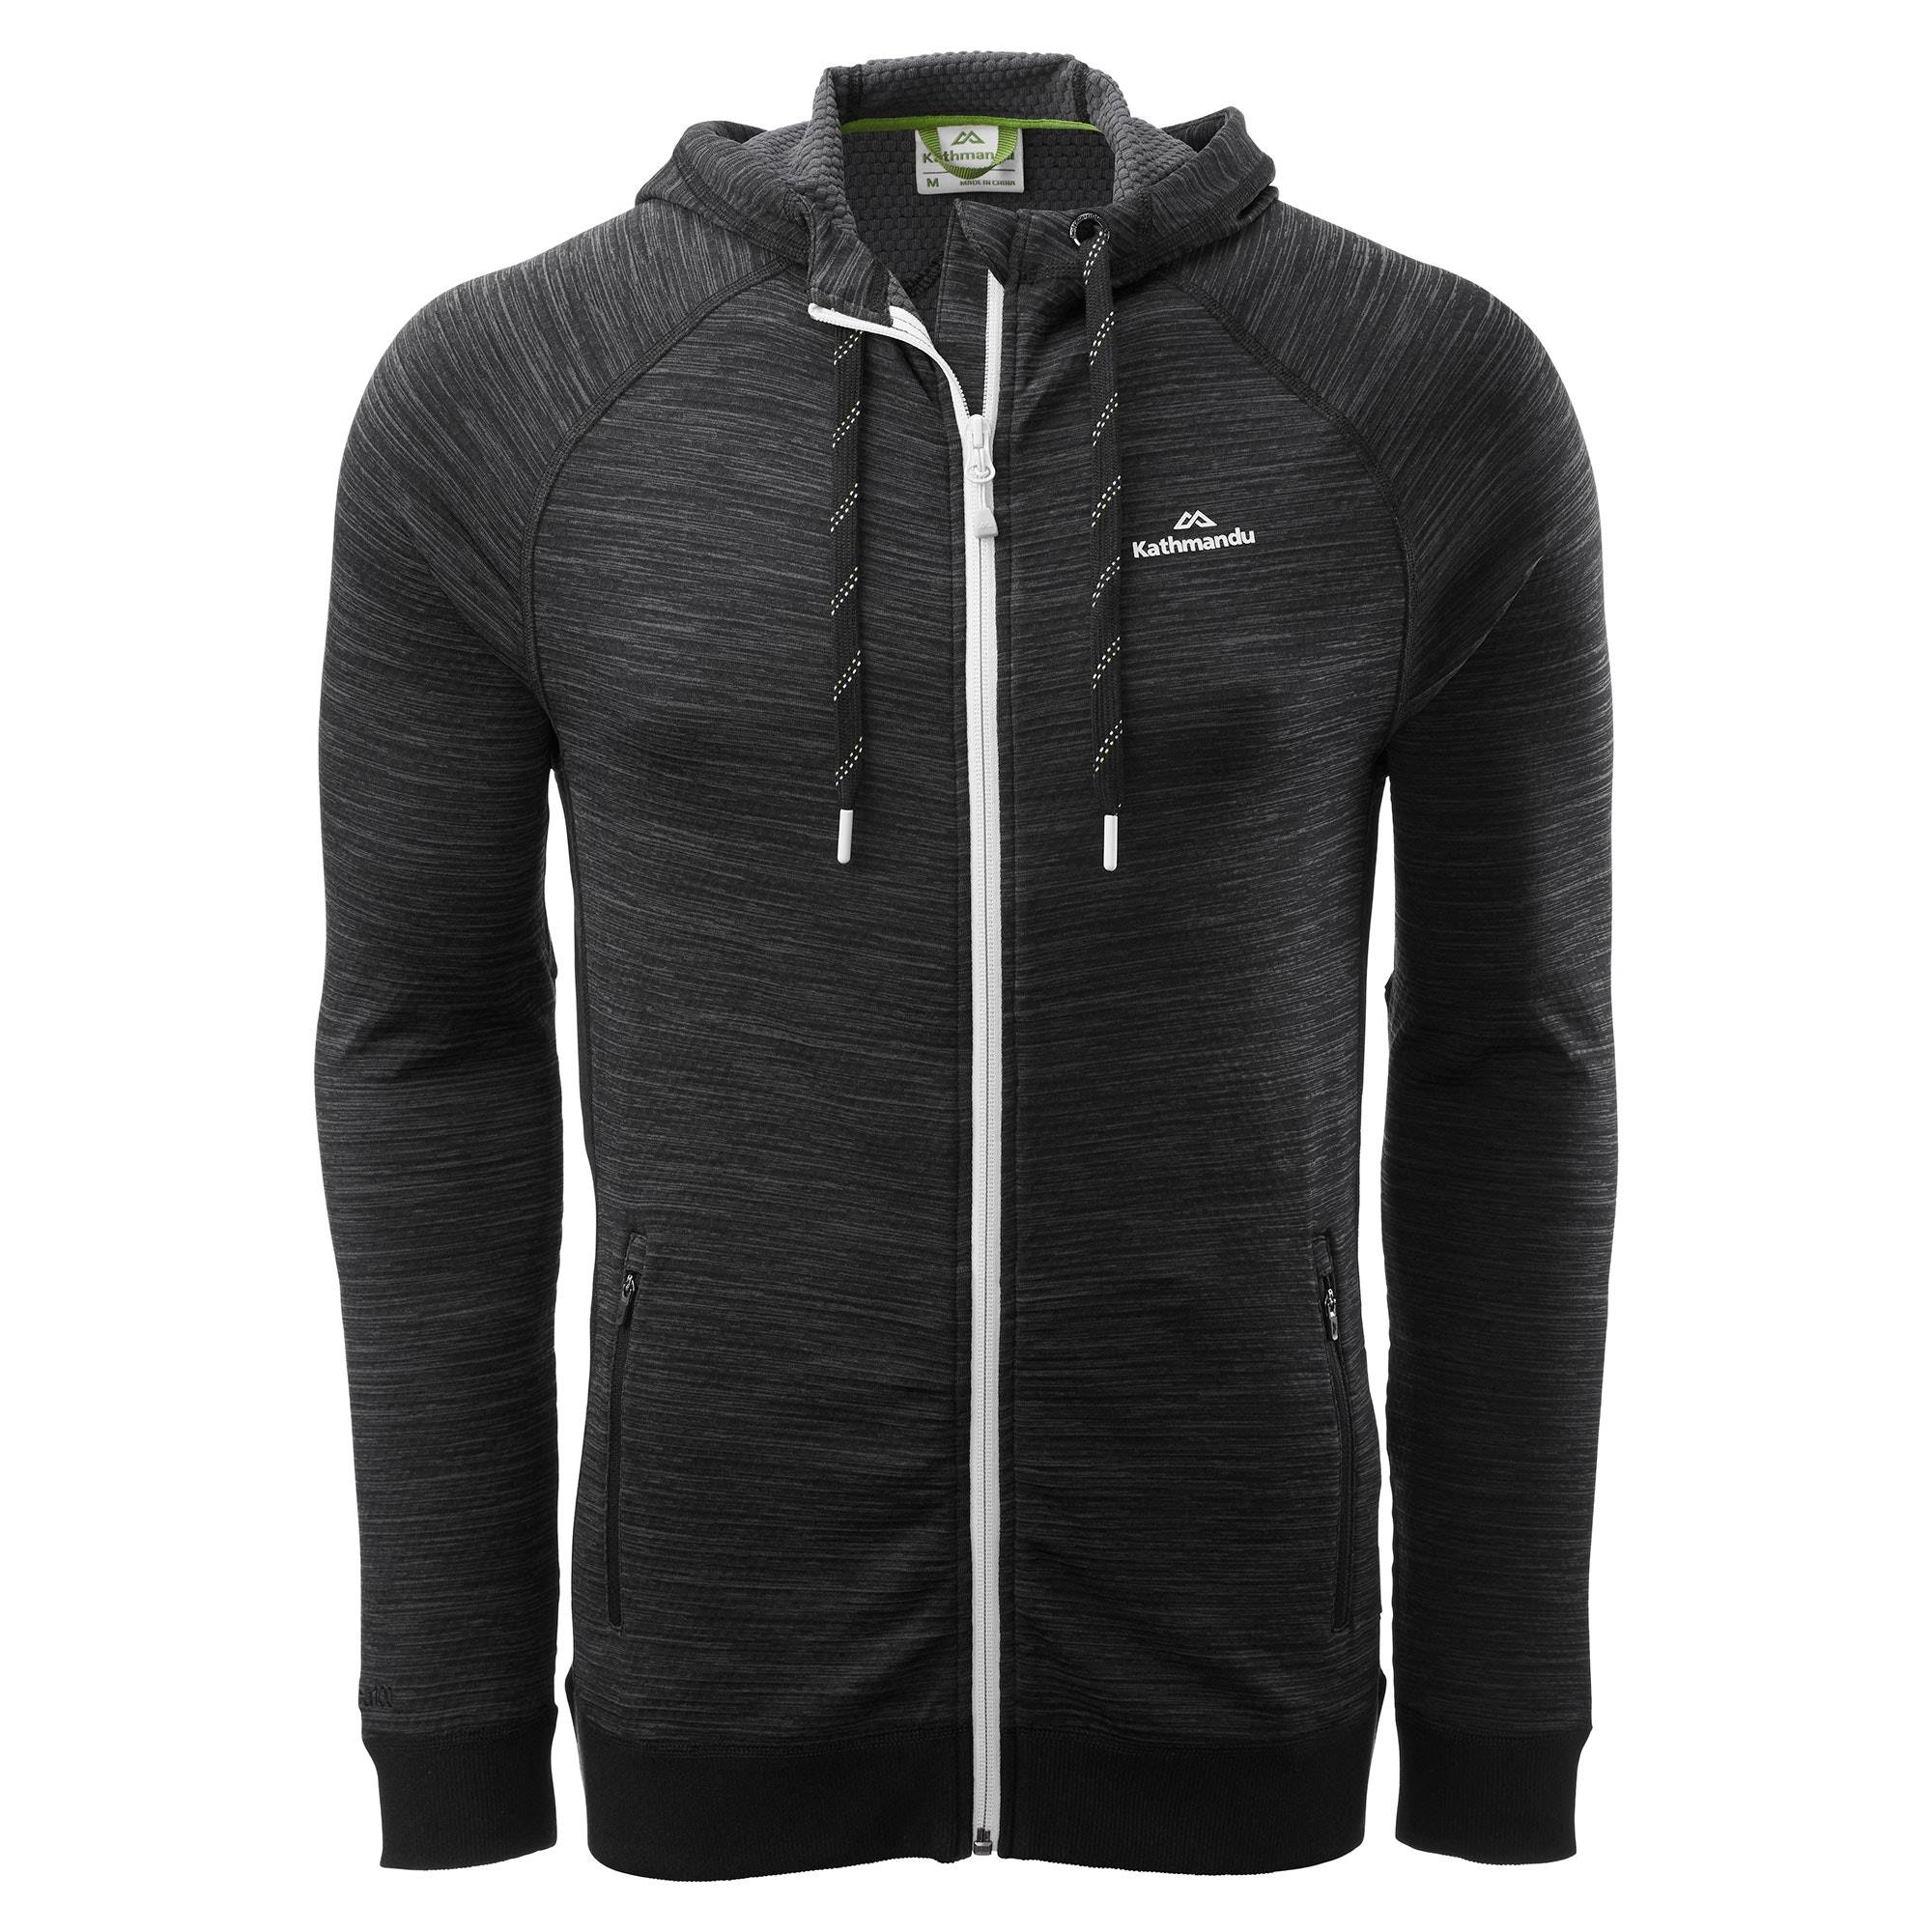 Kathmandu Acota Men's Hooded Fleece Jacket  - Granite Marle/Black - Size: 2X-Large